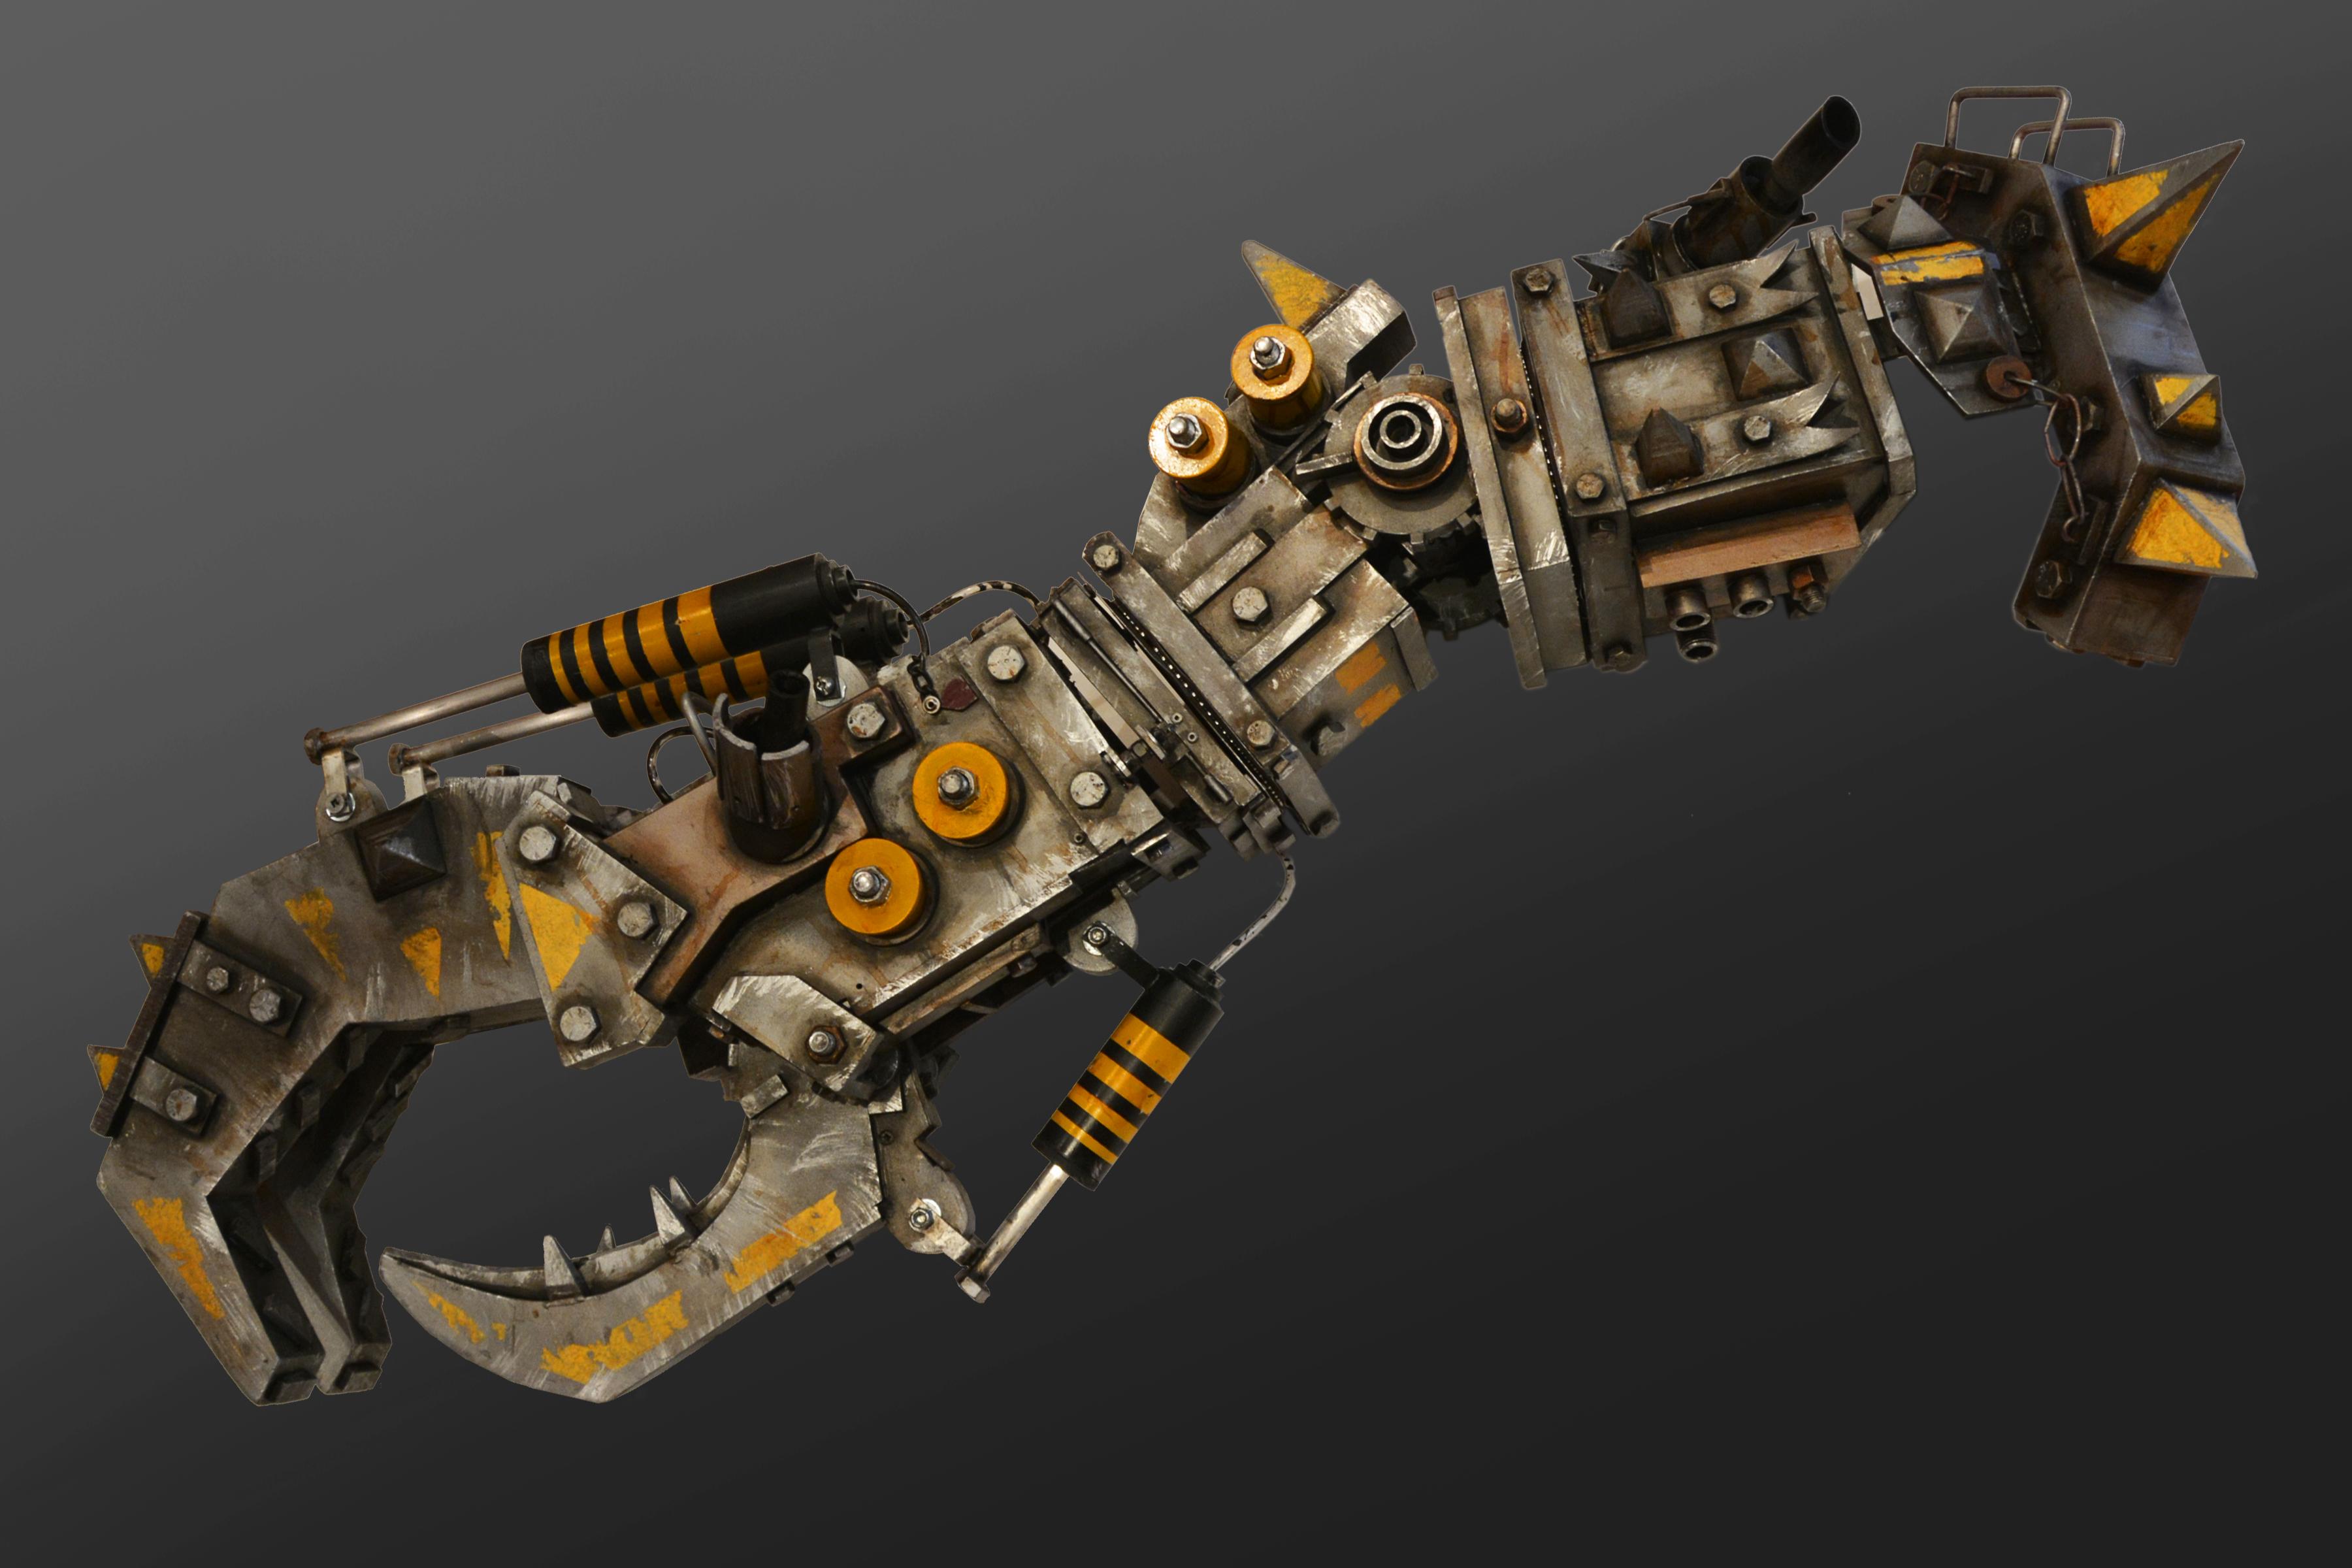 ork 40k orc mega armor nob cosplay